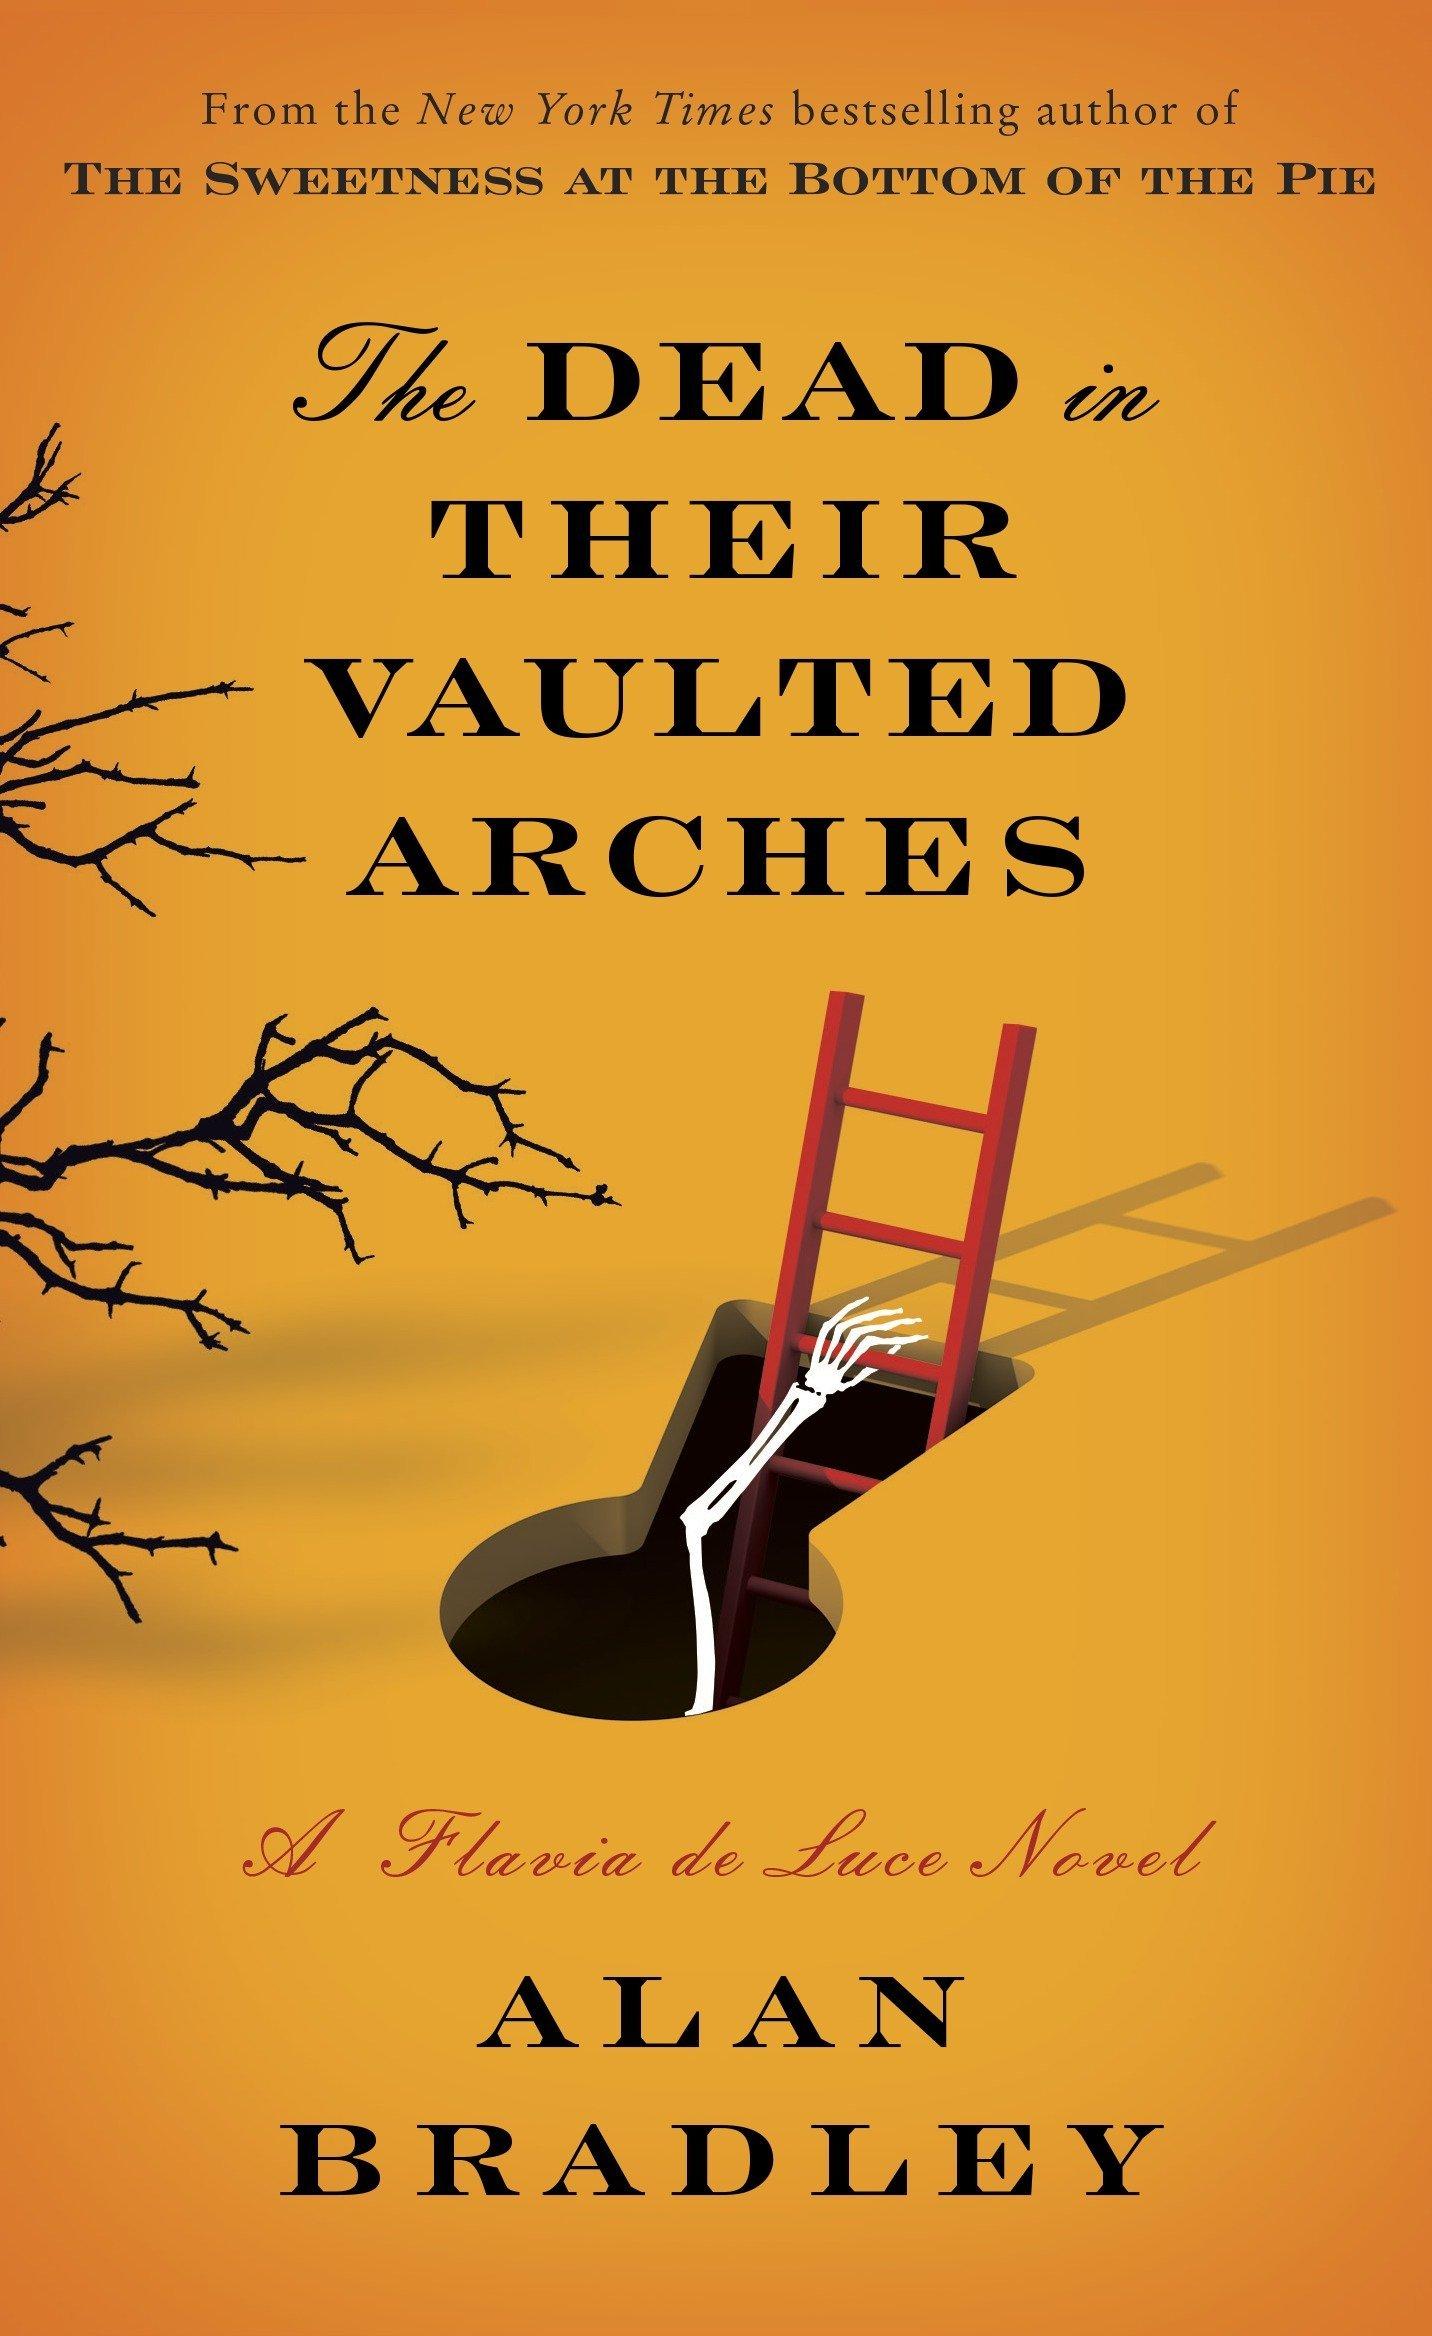 Amazon.com: The Dead in Their Vaulted Arches: A Flavia de Luce Novel  (9780385344050): Alan Bradley: Books